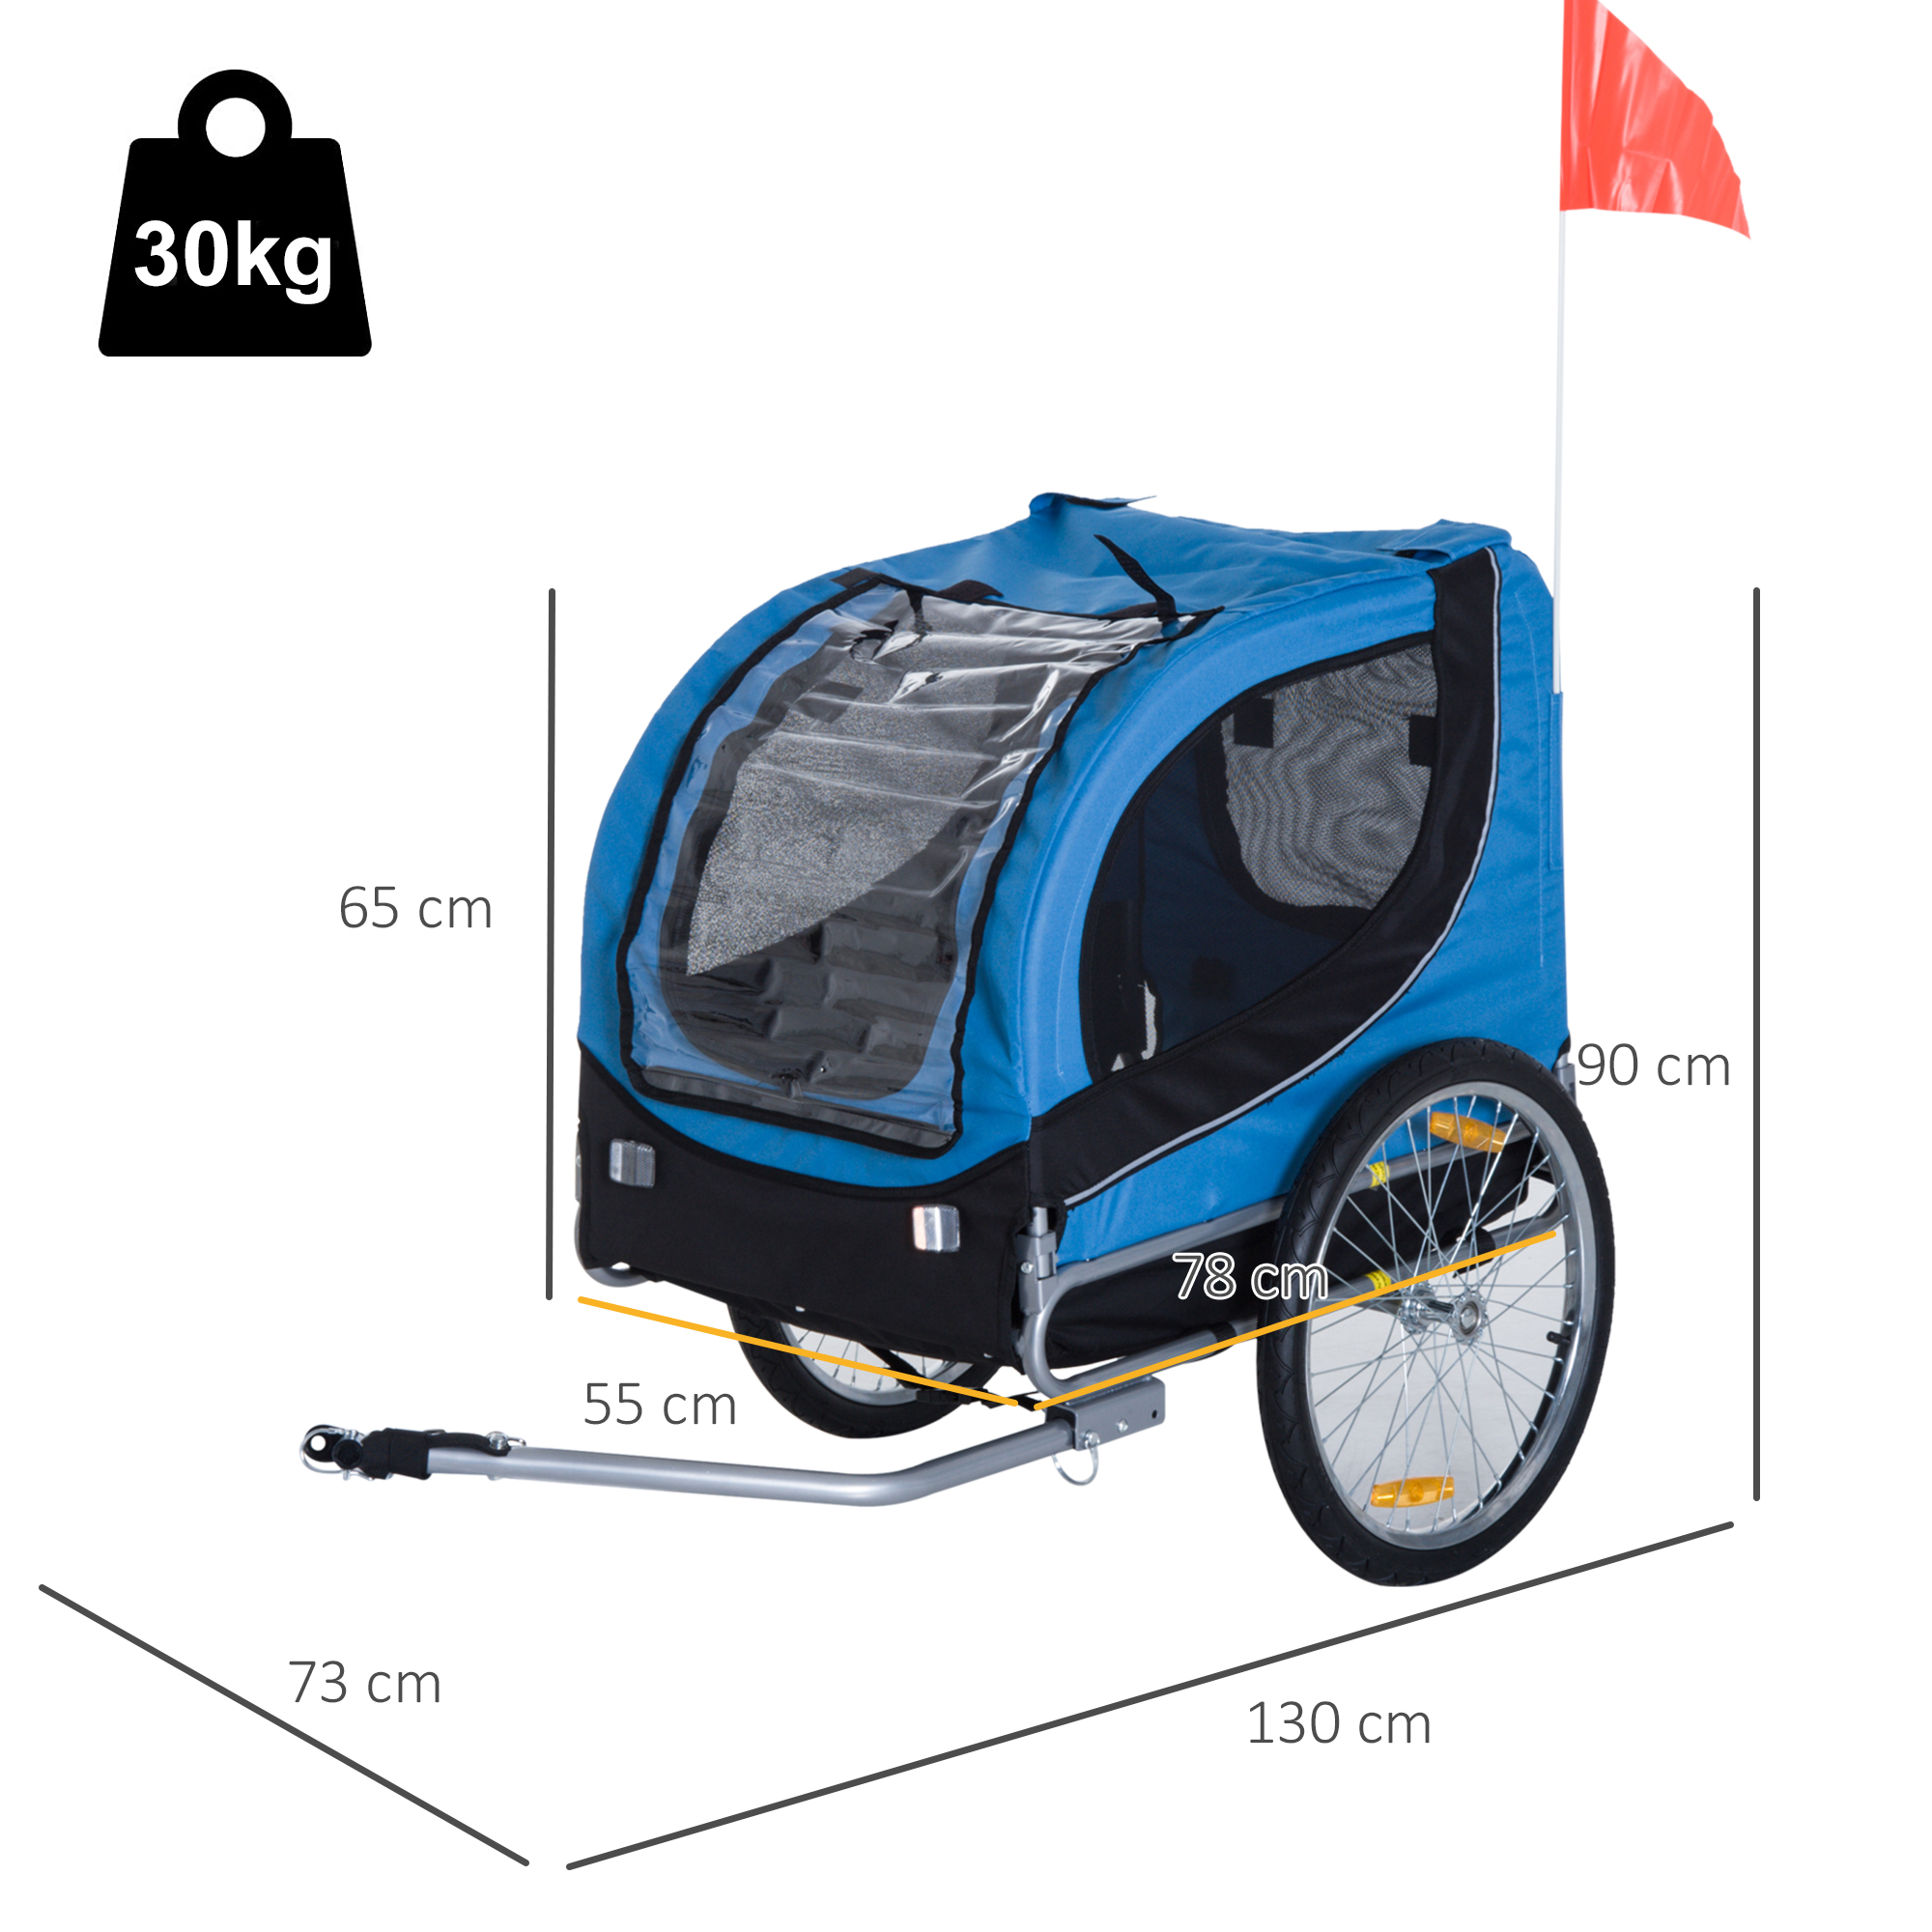 Pet Dog Bike Trailer Stroller Hitch Step Removable Cover ...